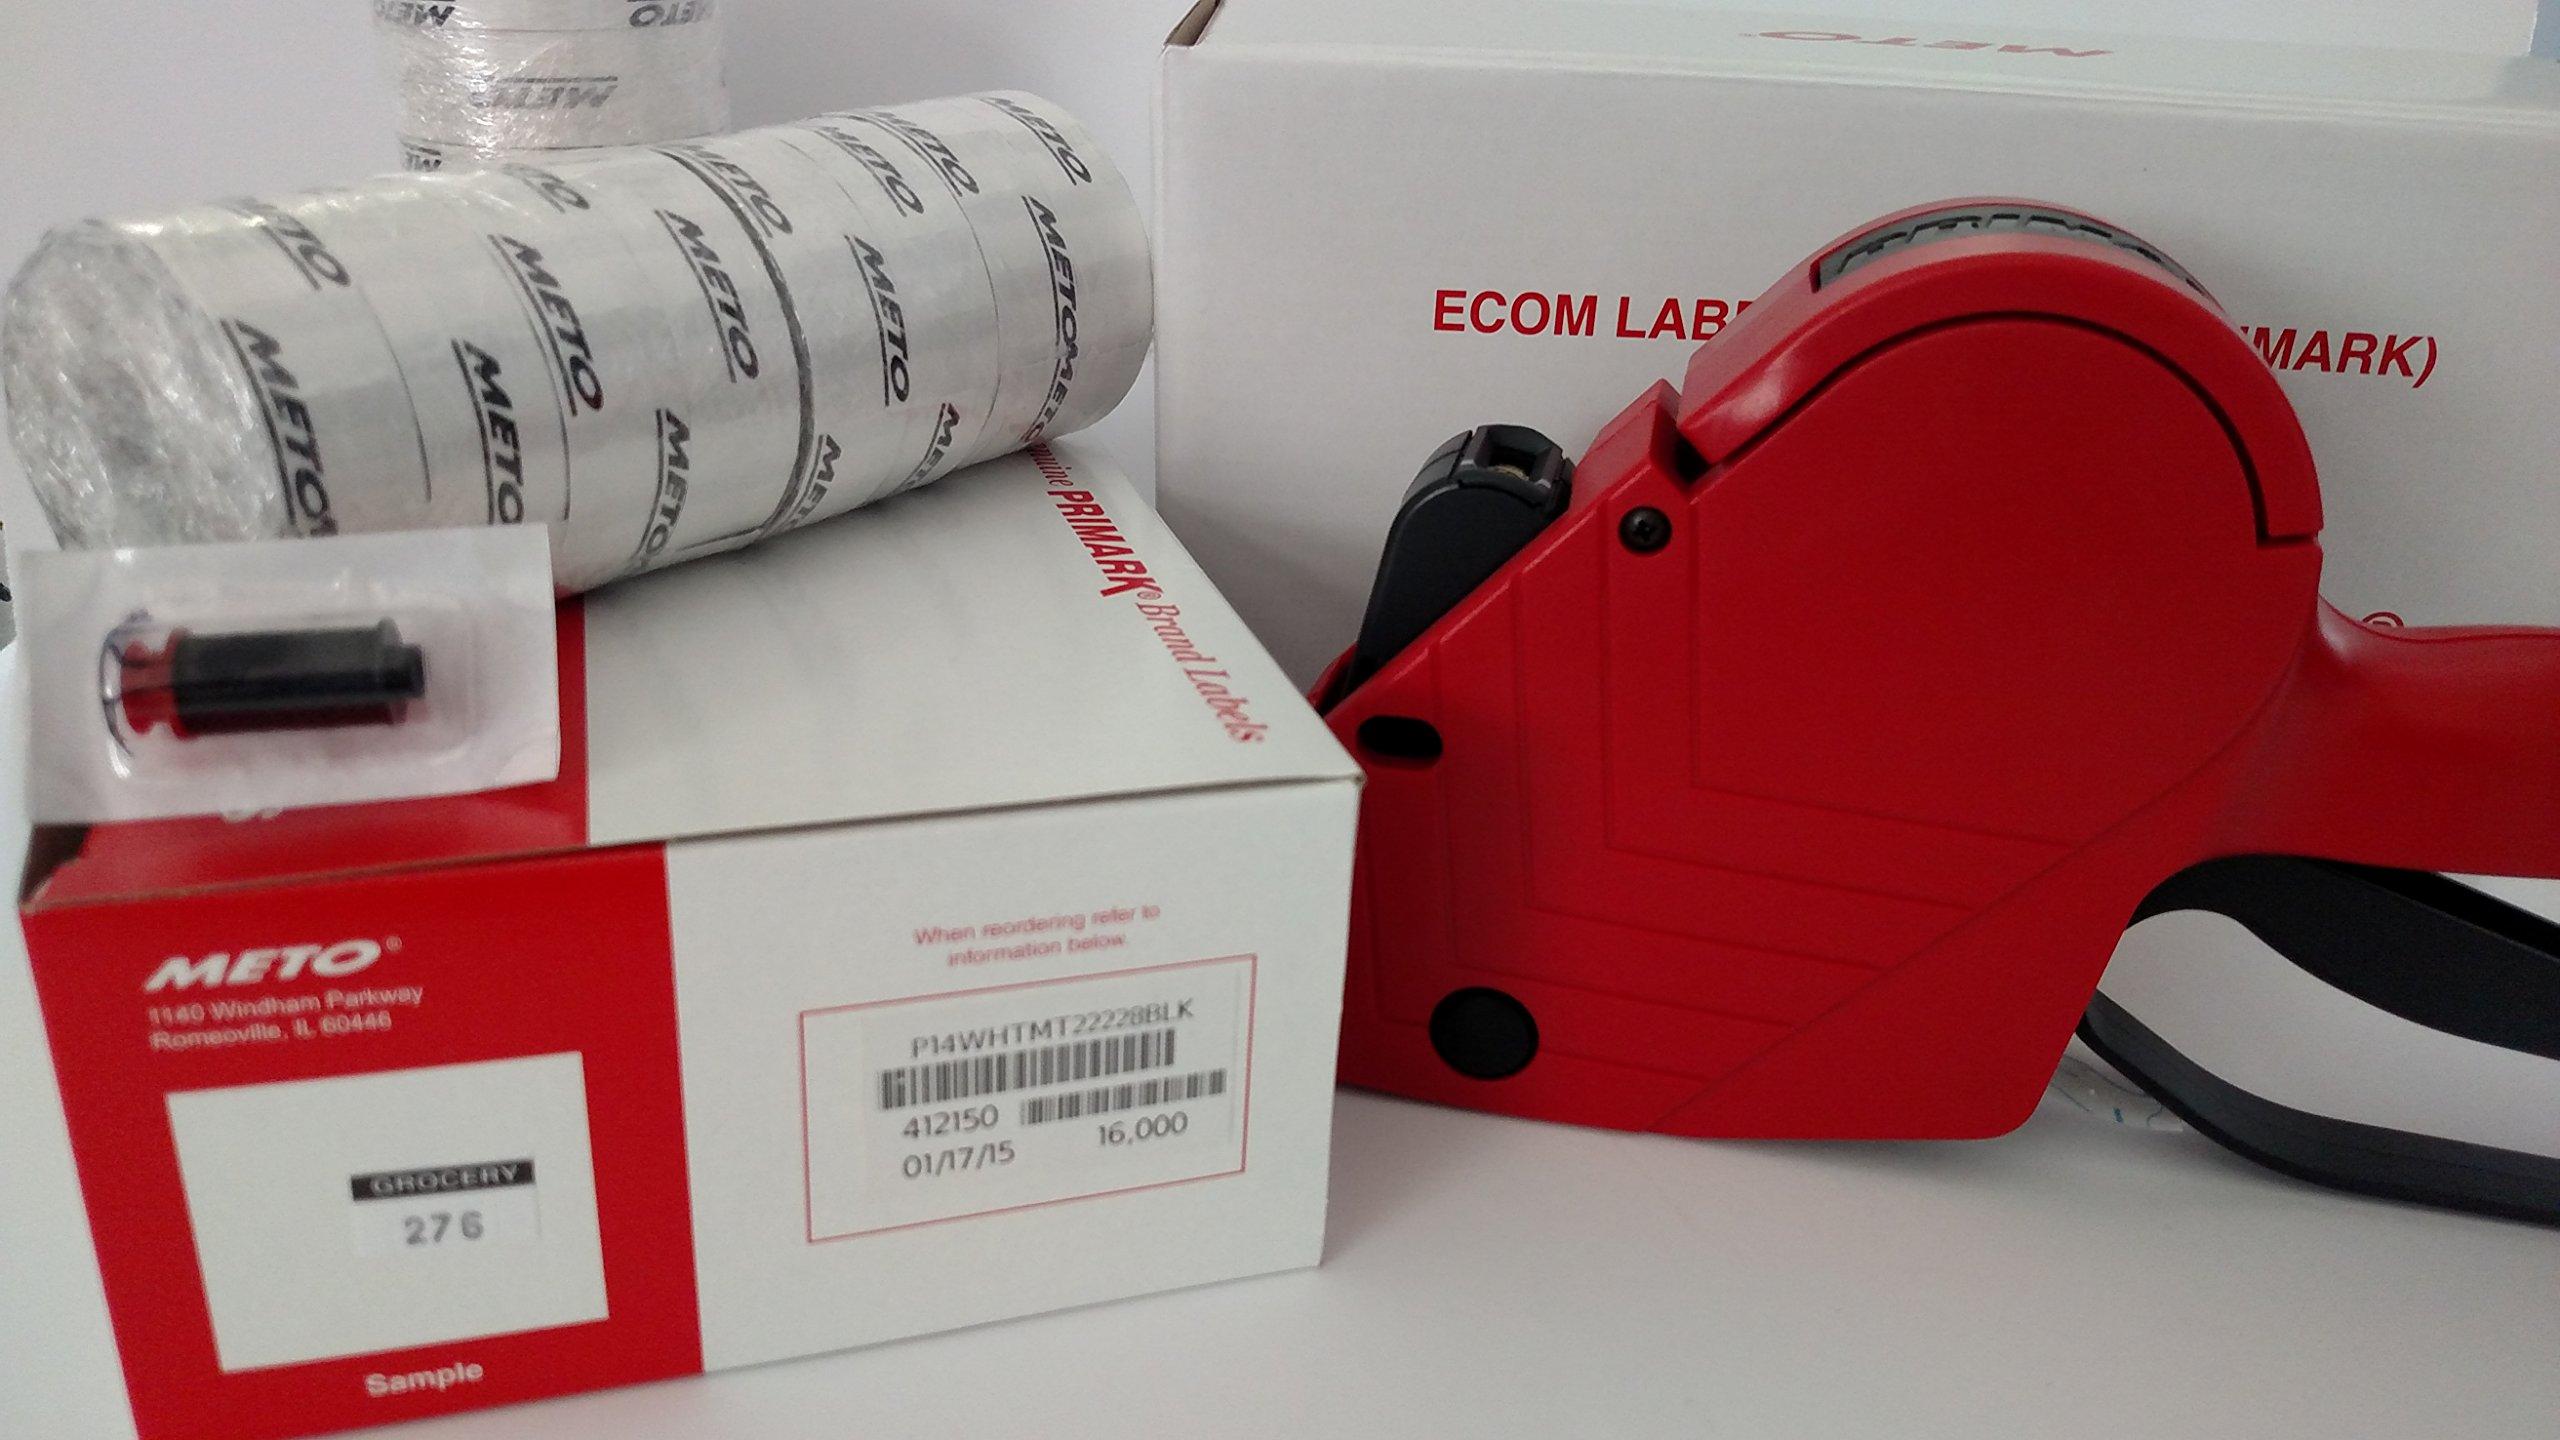 Primark P14 Price Labelgun Value Pack, Pricing Gun, Box White (Grocery Print) Labels, Ink Roller